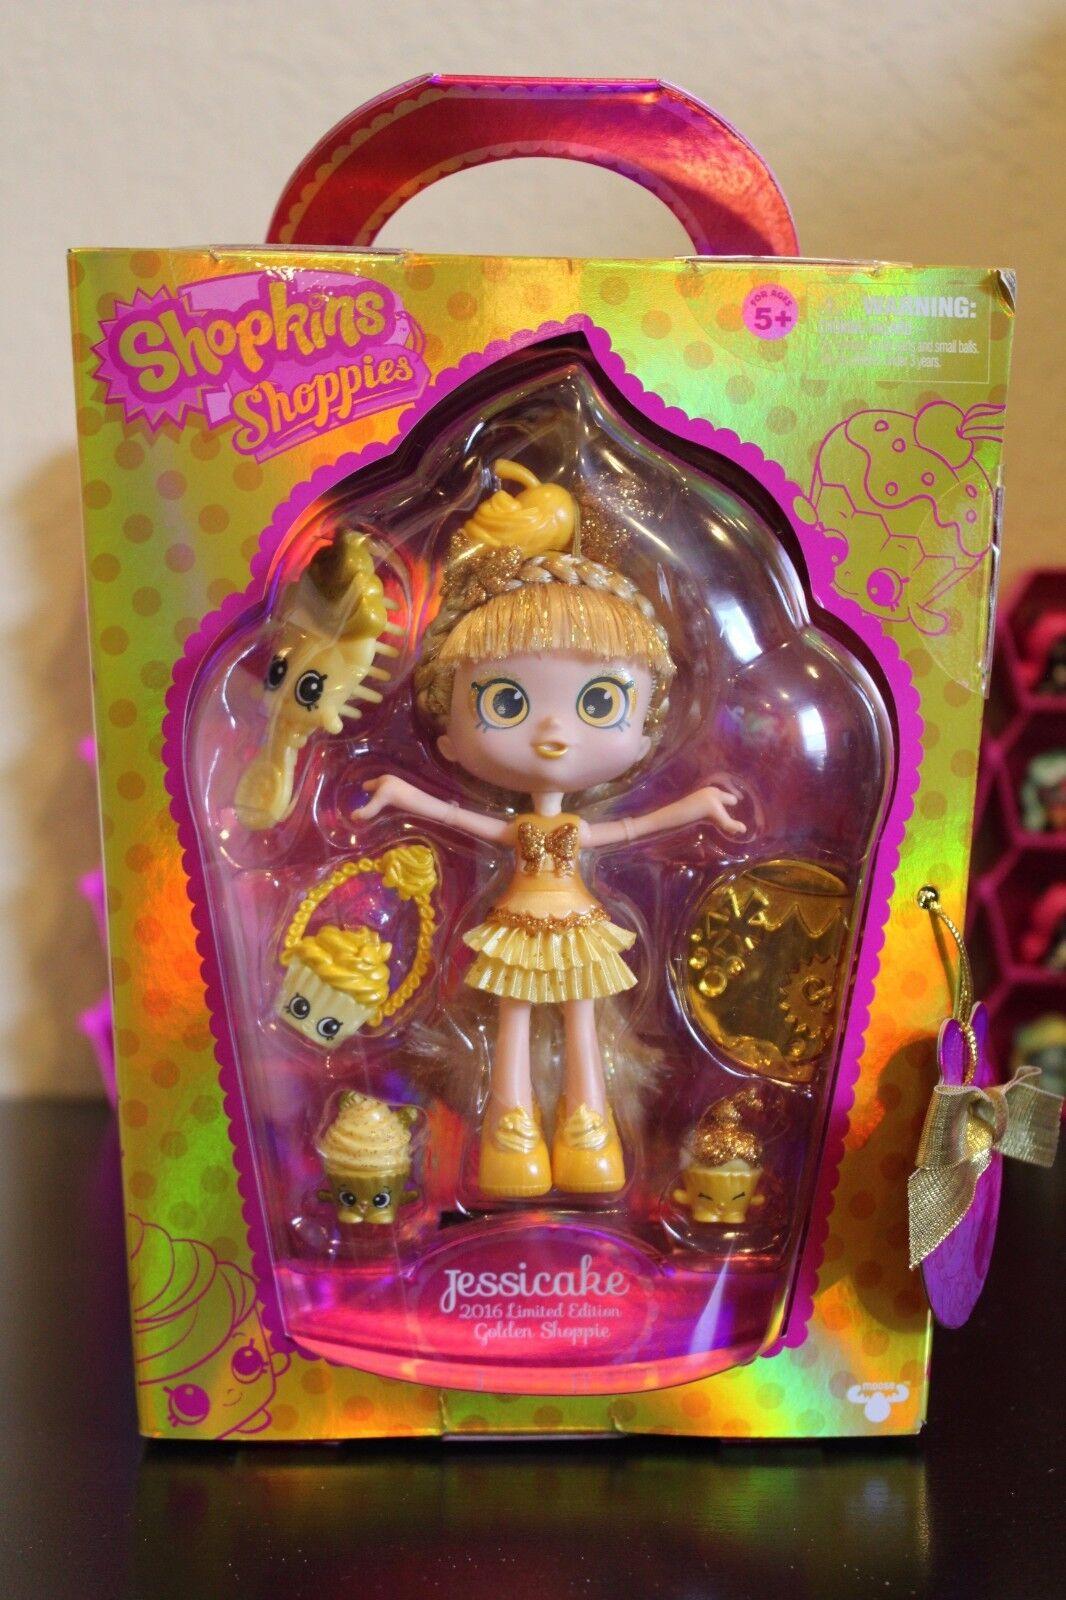 SDCC 2016 Exclusive Shopkins Shoppies Jessicake LE golden Shoppie -- In Hand